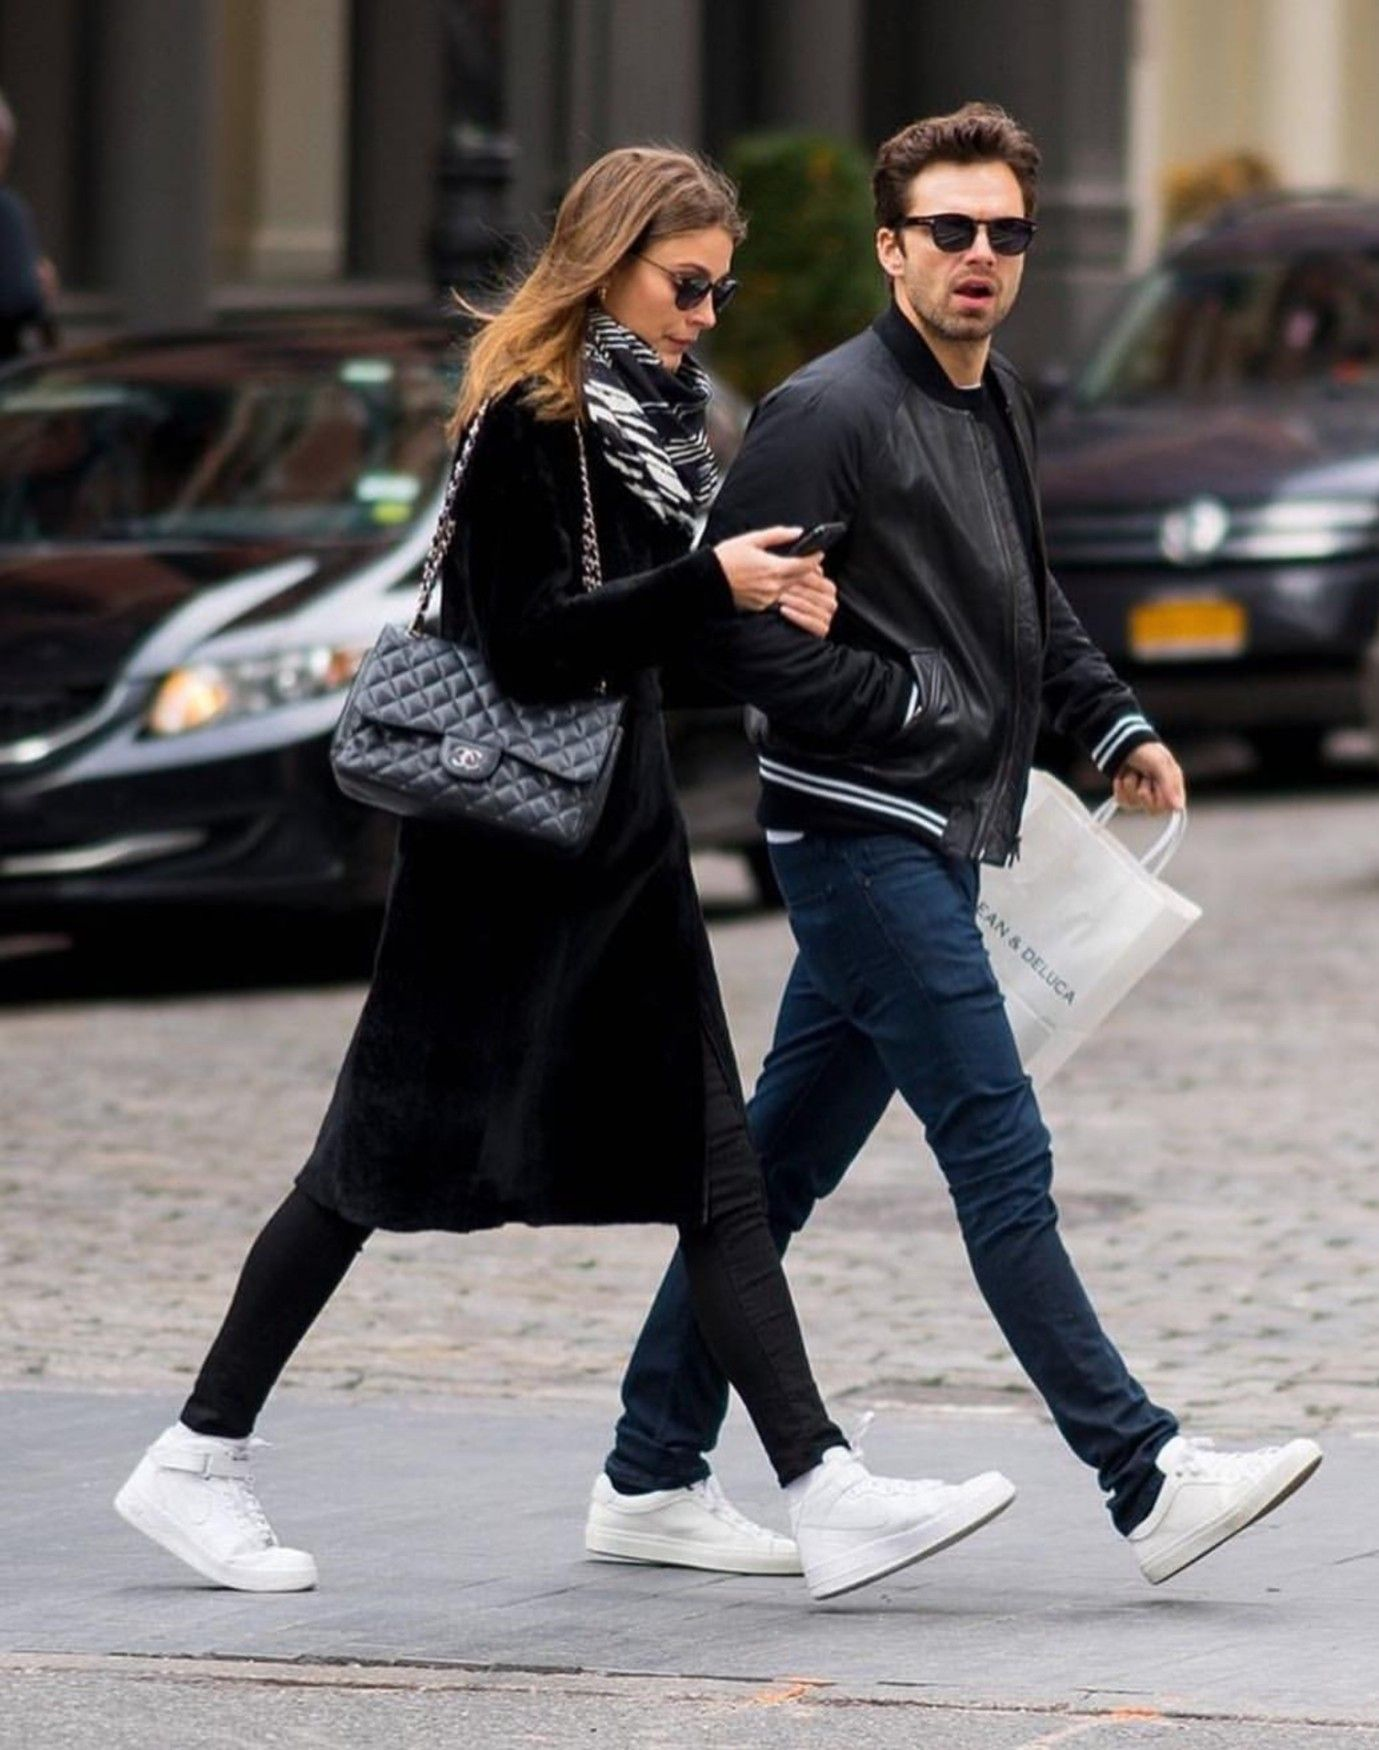 Sebastian Stan in New York City October 14, 2018 with